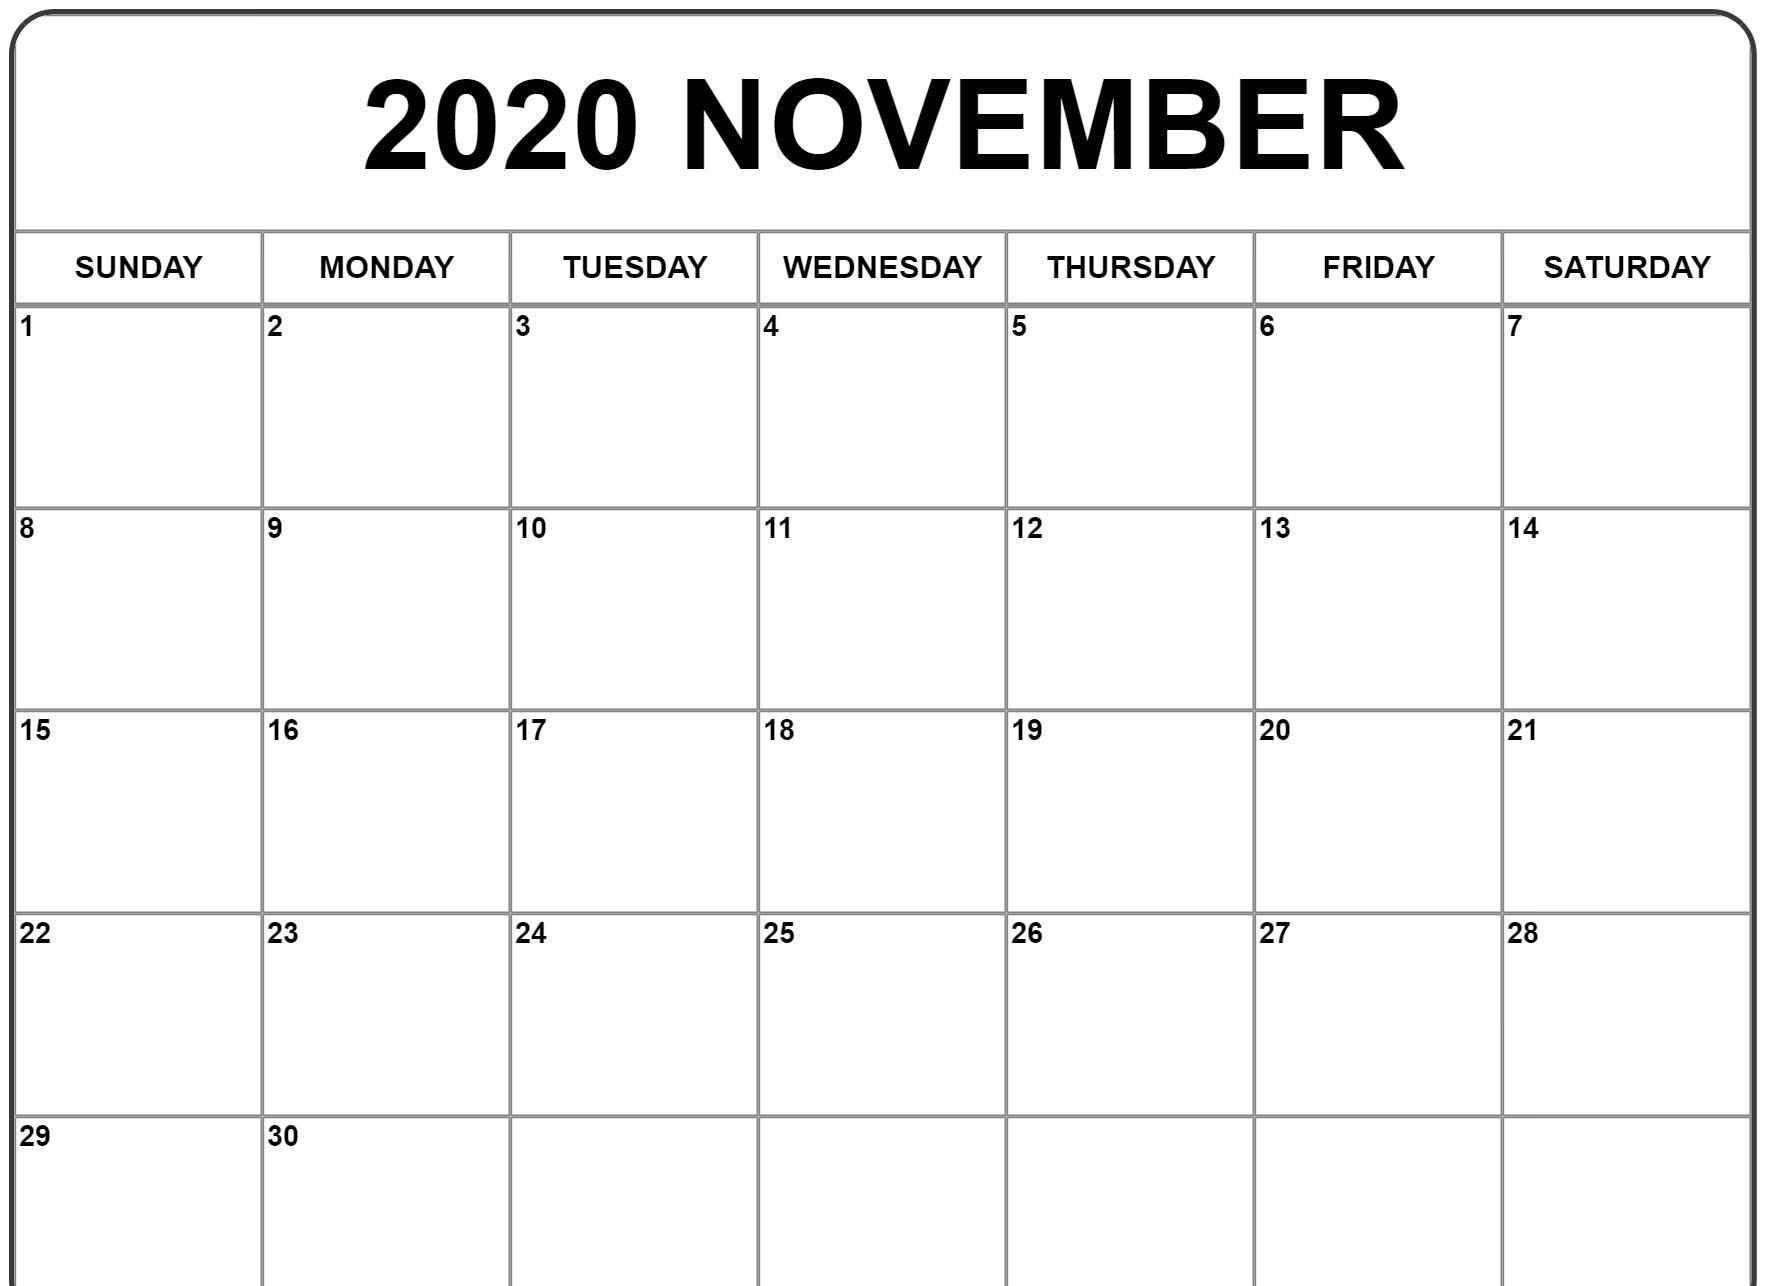 Blank November 2020 Calendar Printable - Wpa.wpart.co